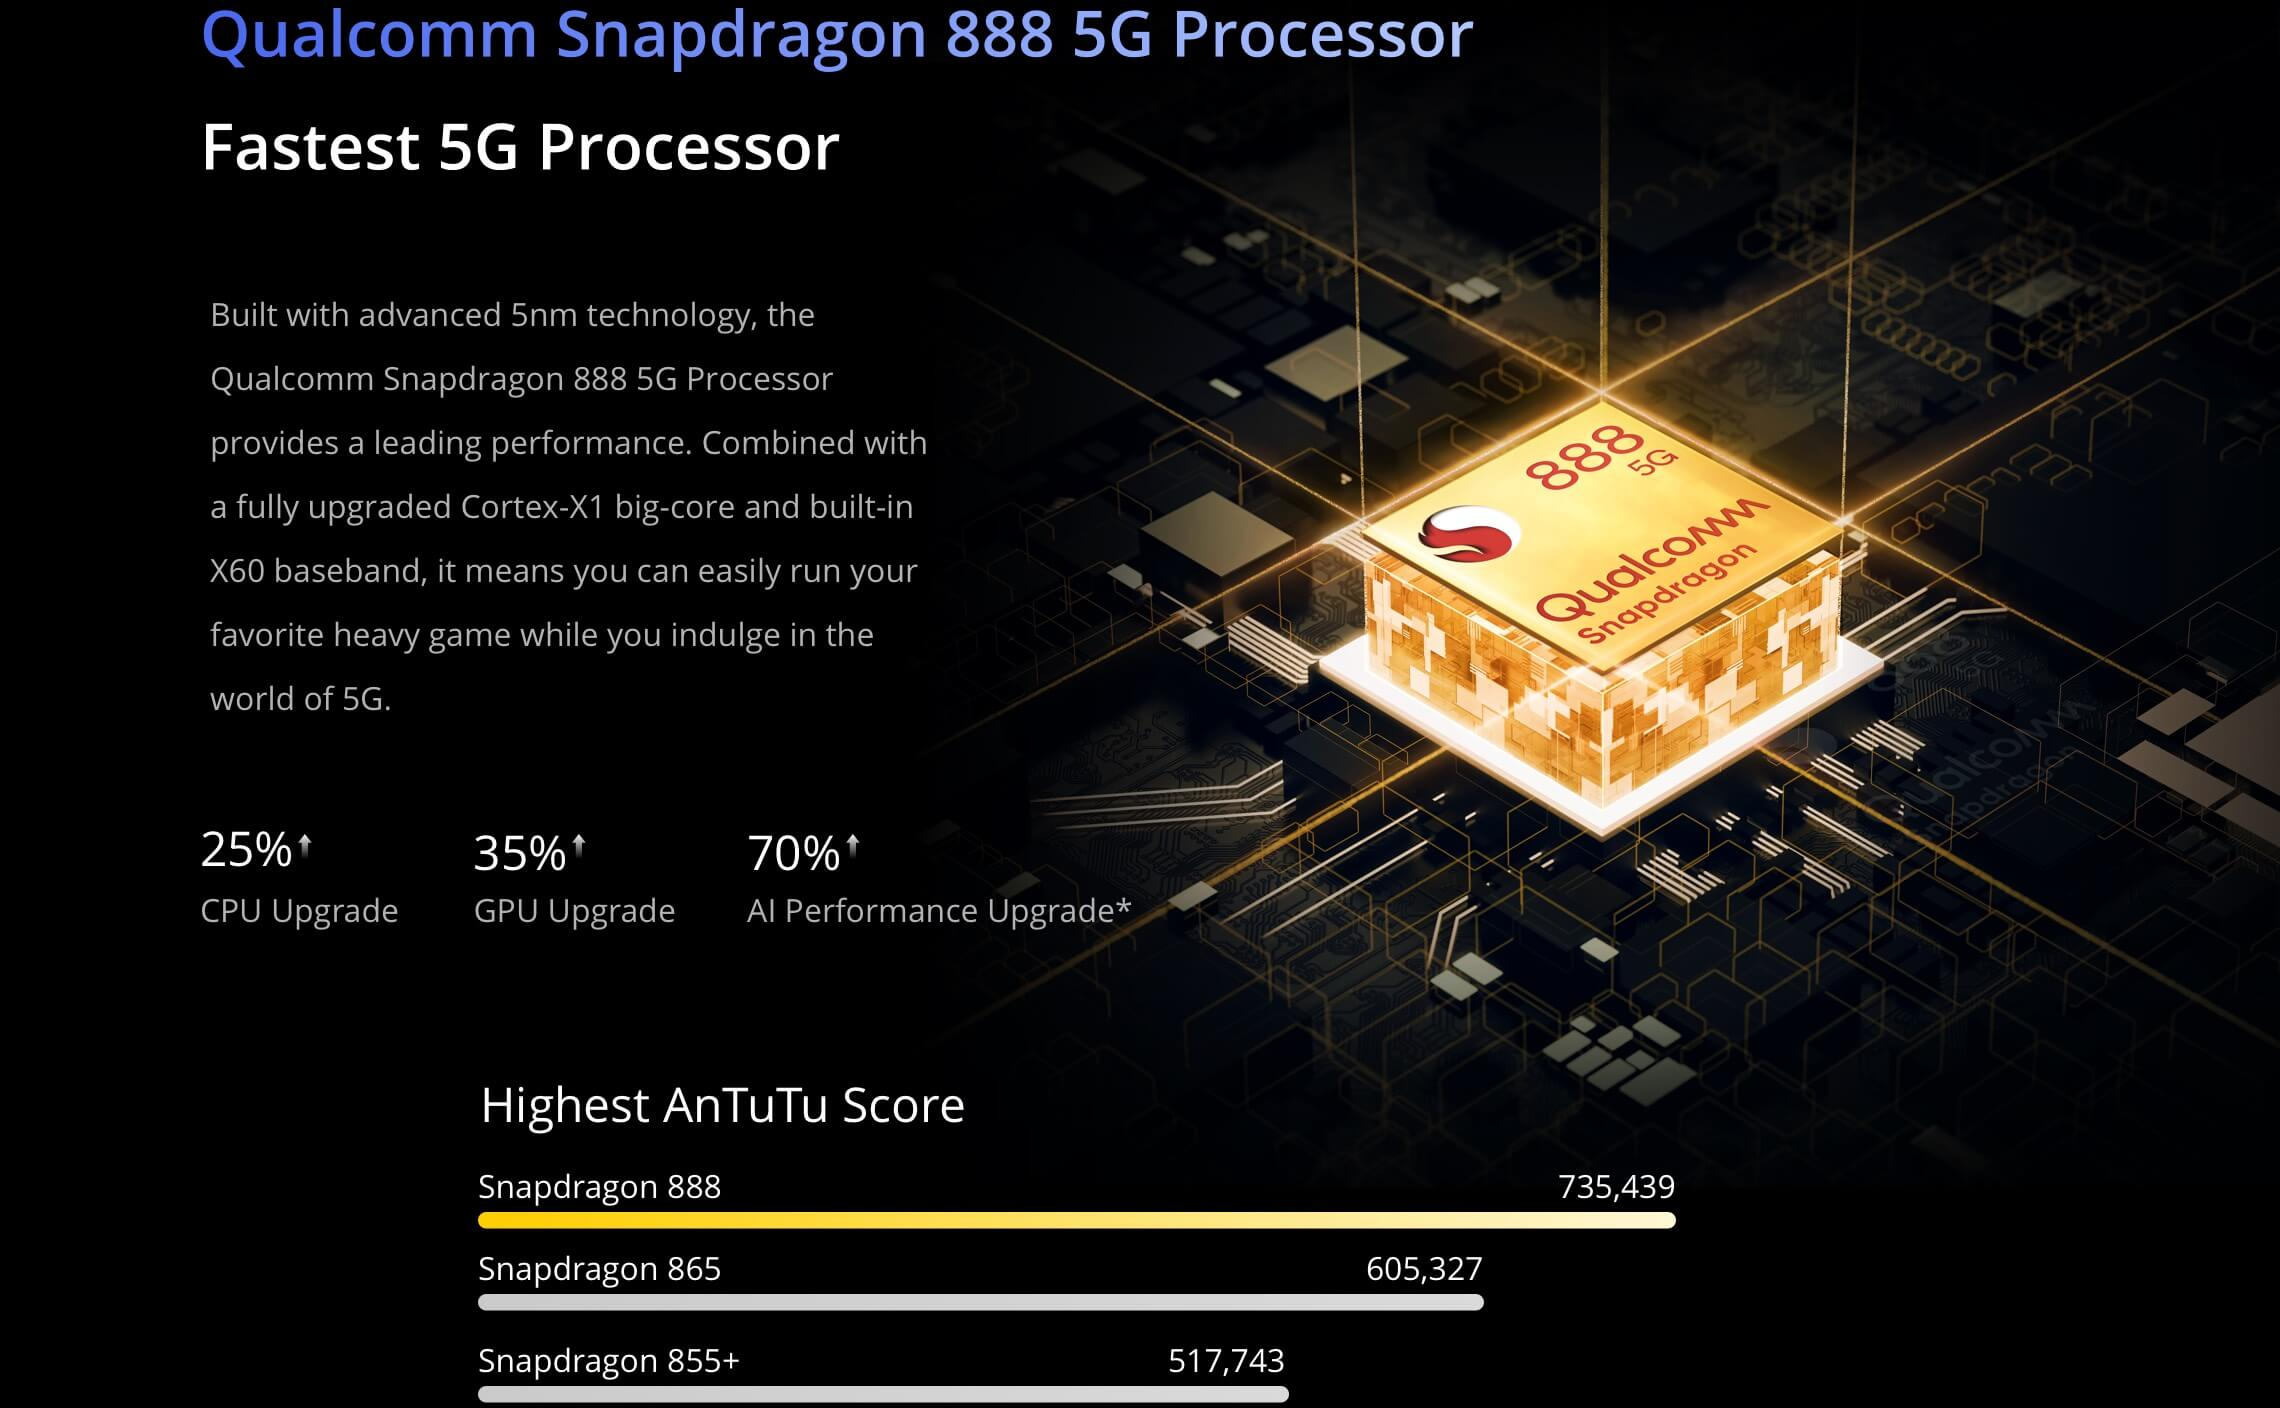 Realme GT 5G processor